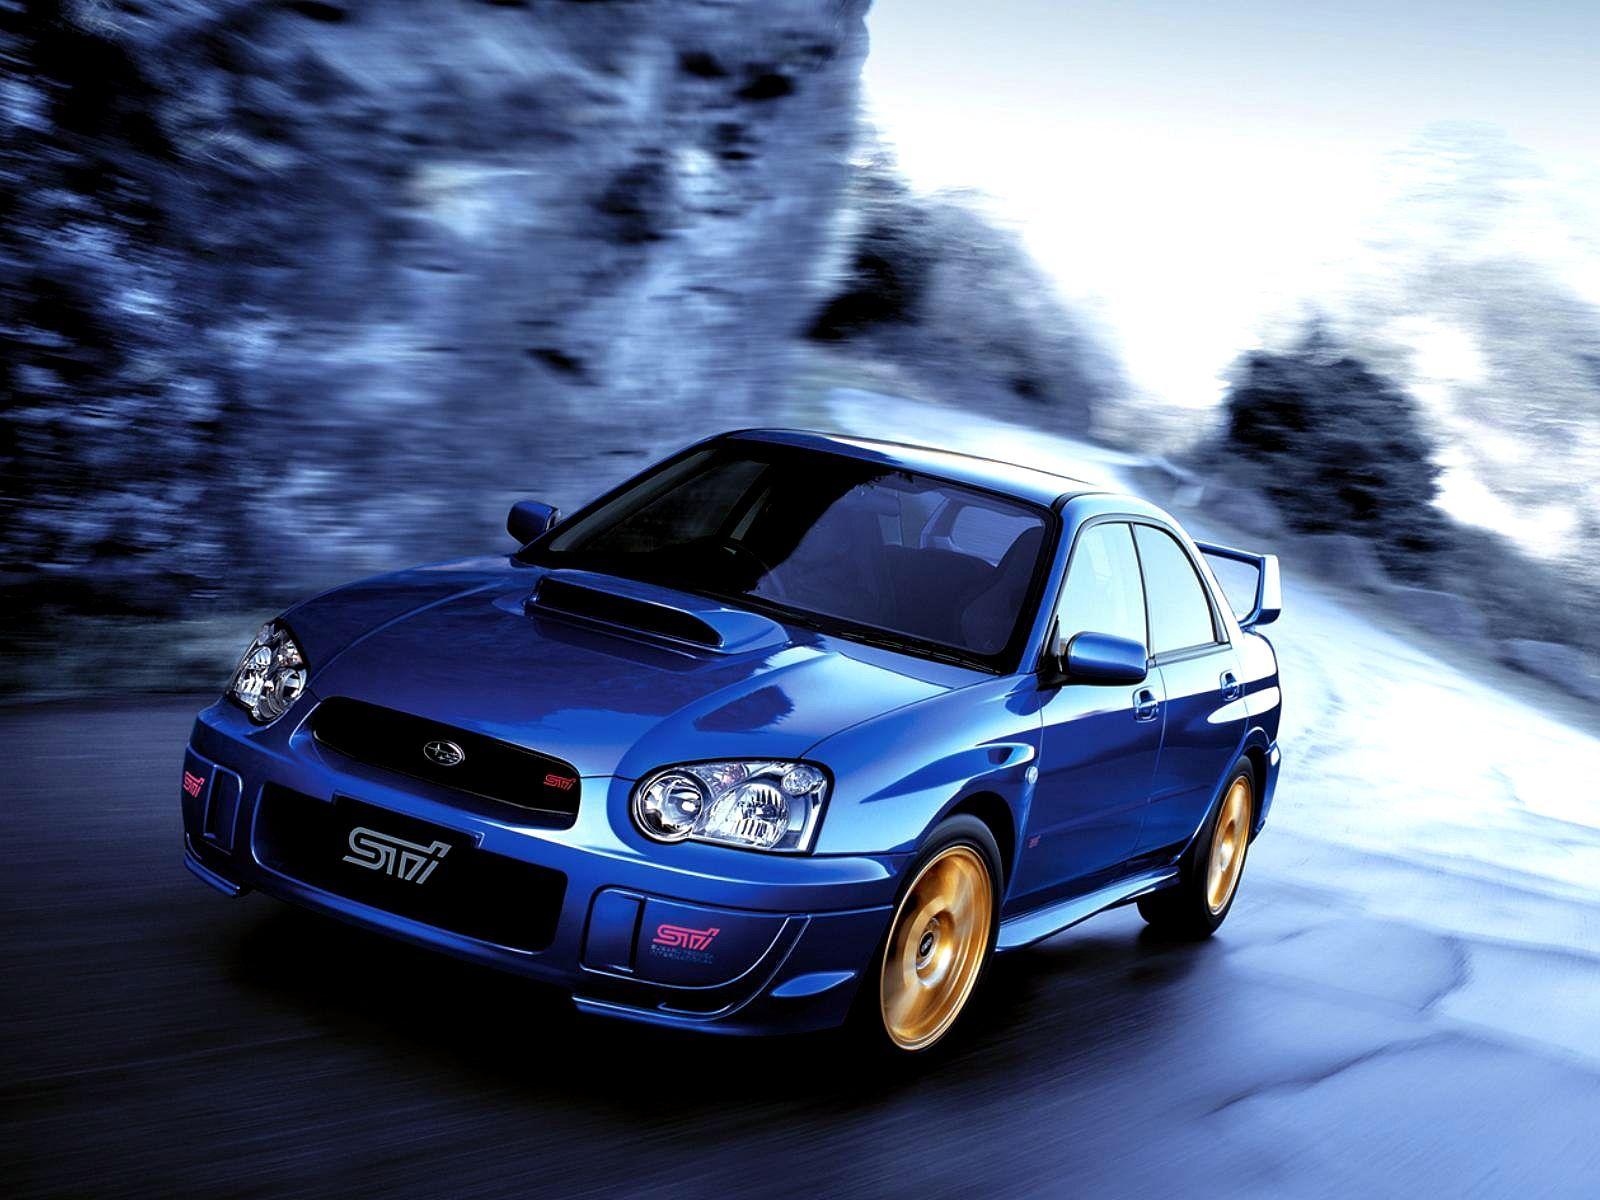 Subaru Impreza Wrx Sti 2004 Wallpaper Impreza Wrx Forester Xt